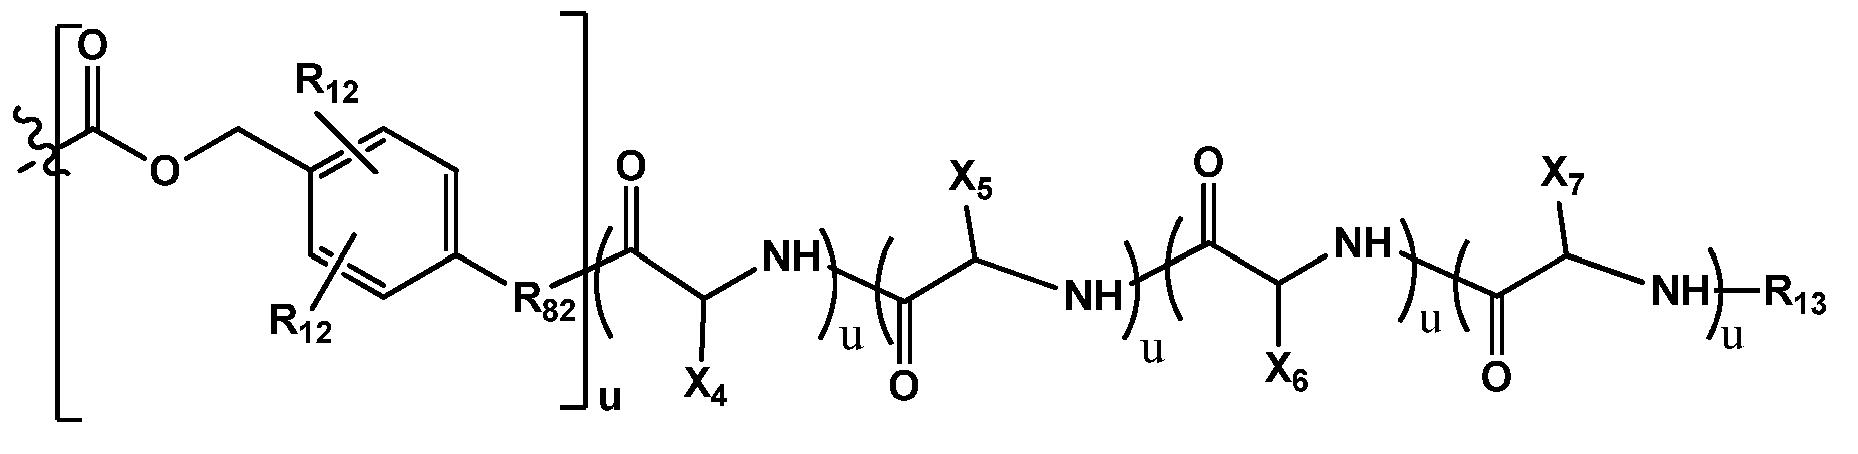 Figure 112014001971018-pct00100